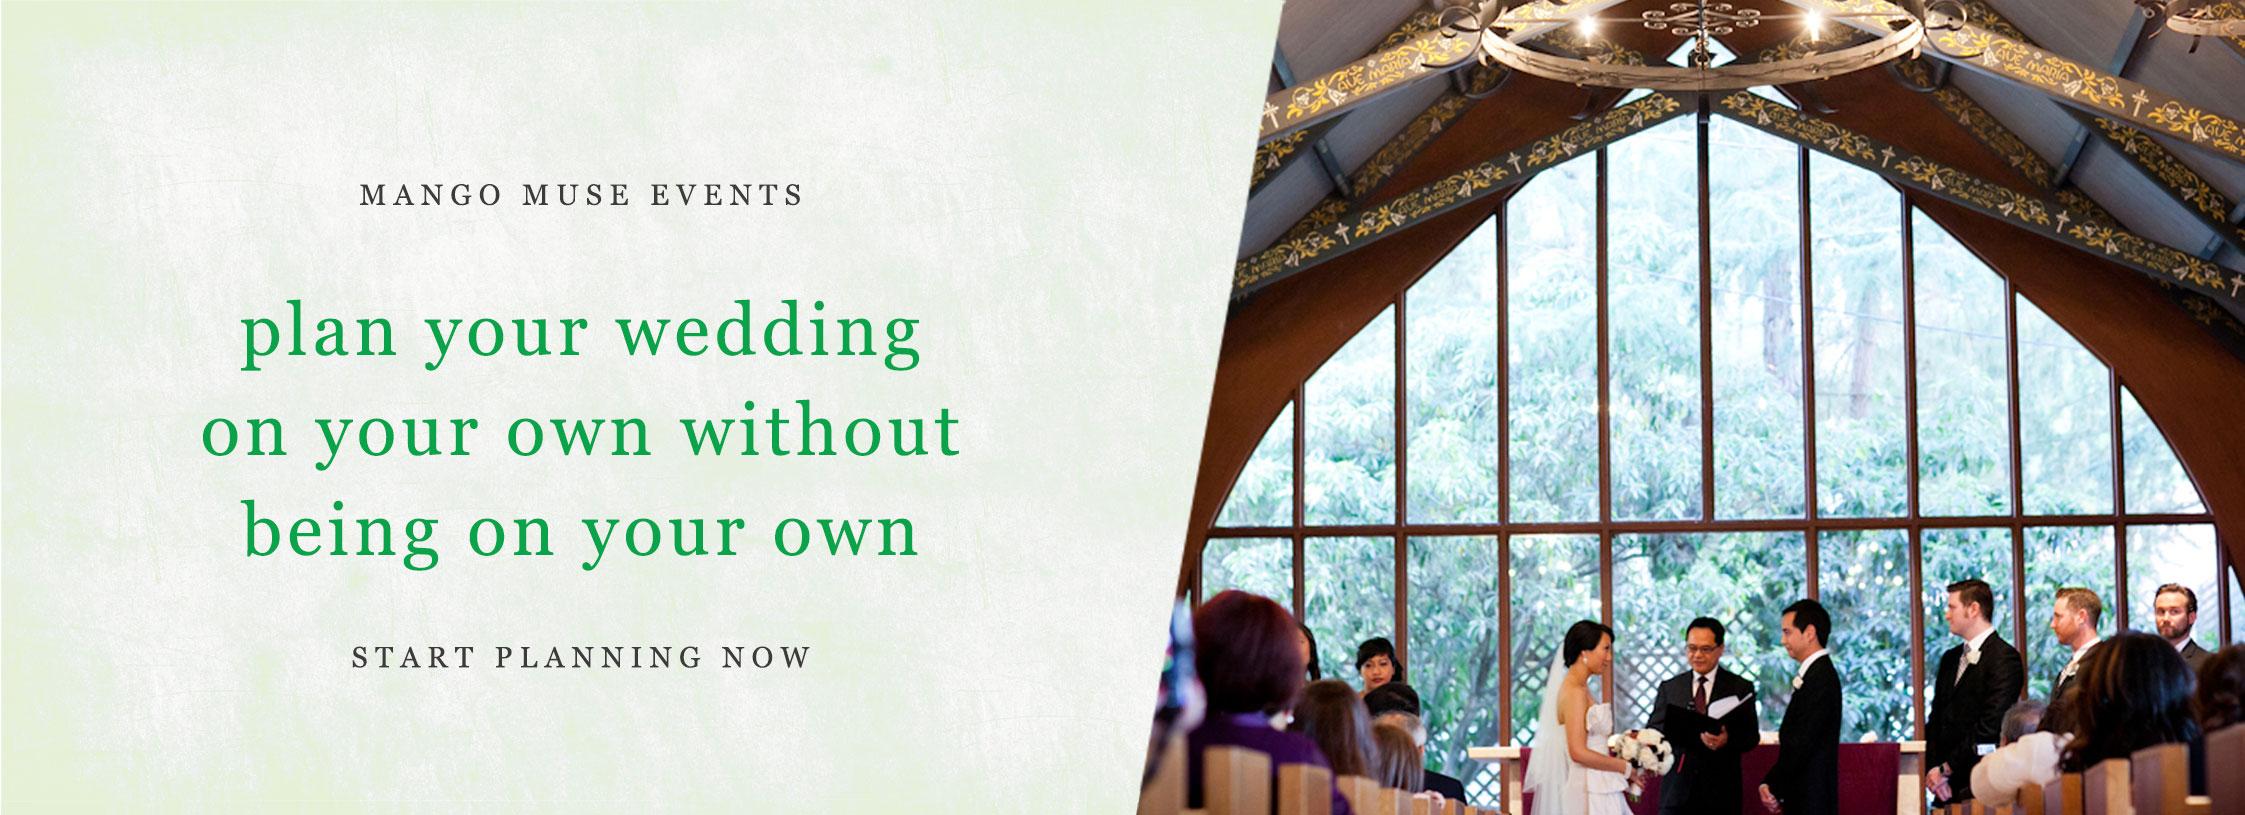 San Francisco chapel wedding by destination wedding planner Mango Muse Events creator of Passport to Joy, the online wedding planning course